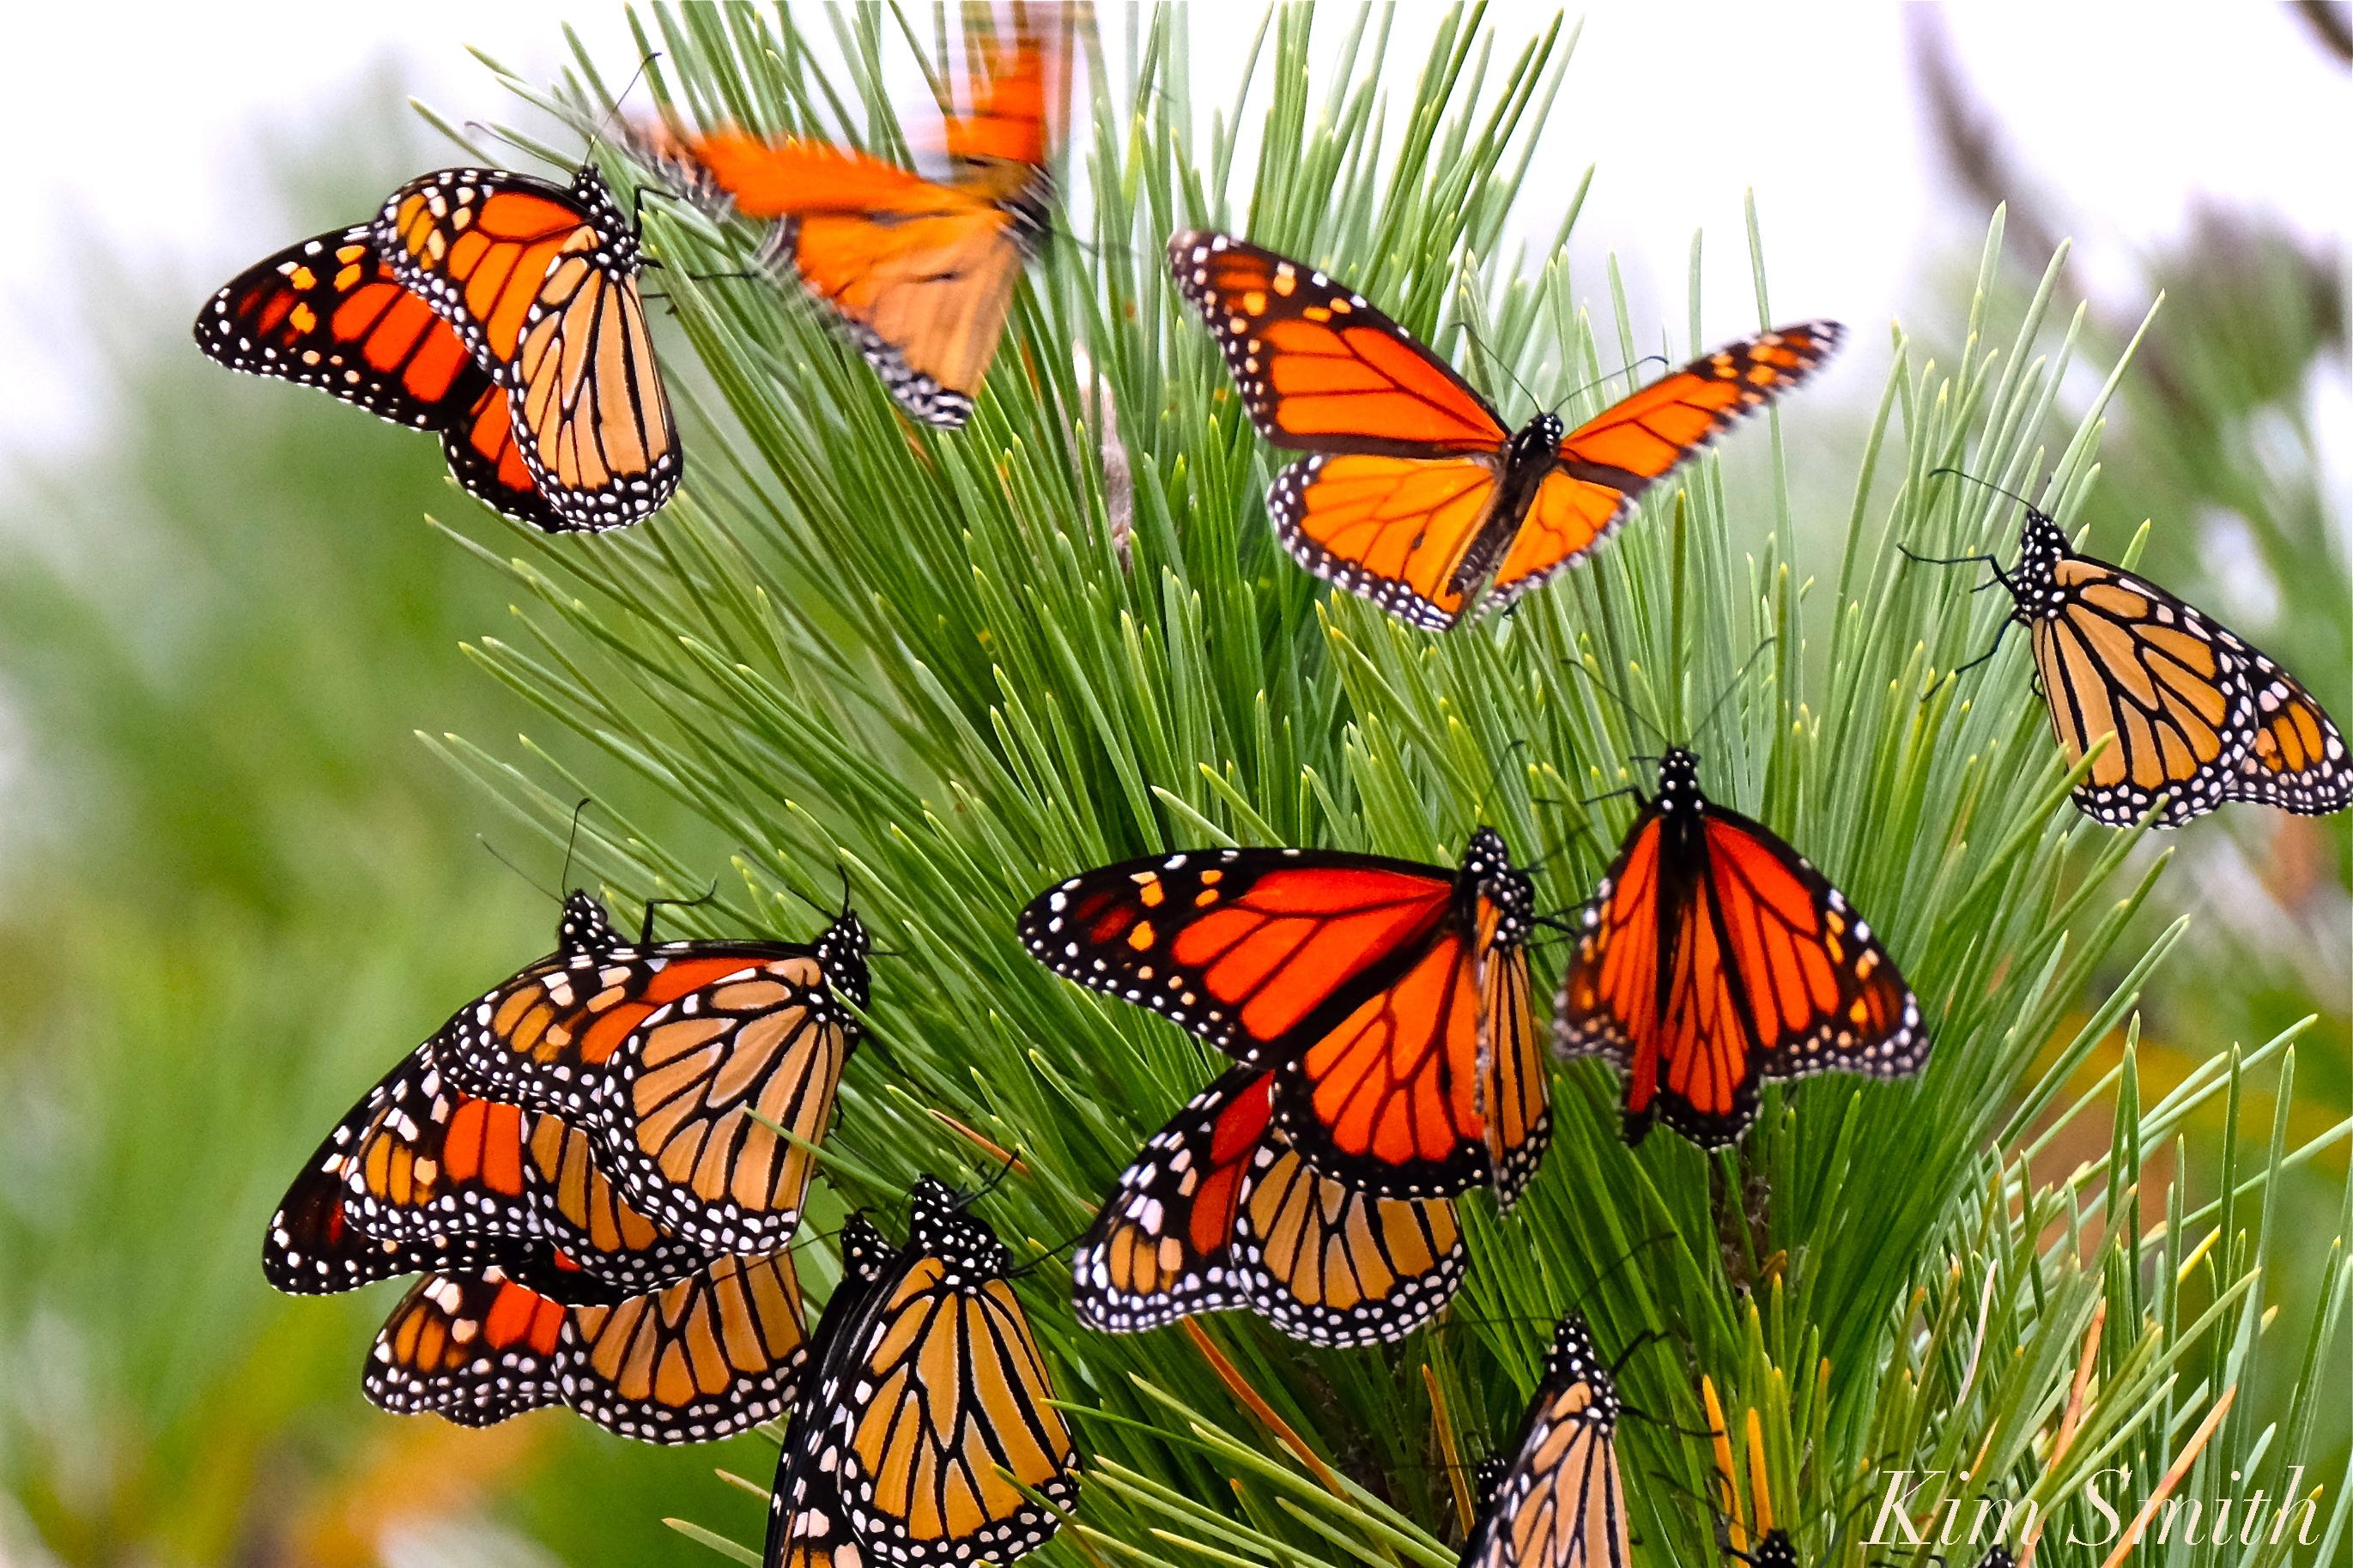 Monarch butterflies flying away - photo#50